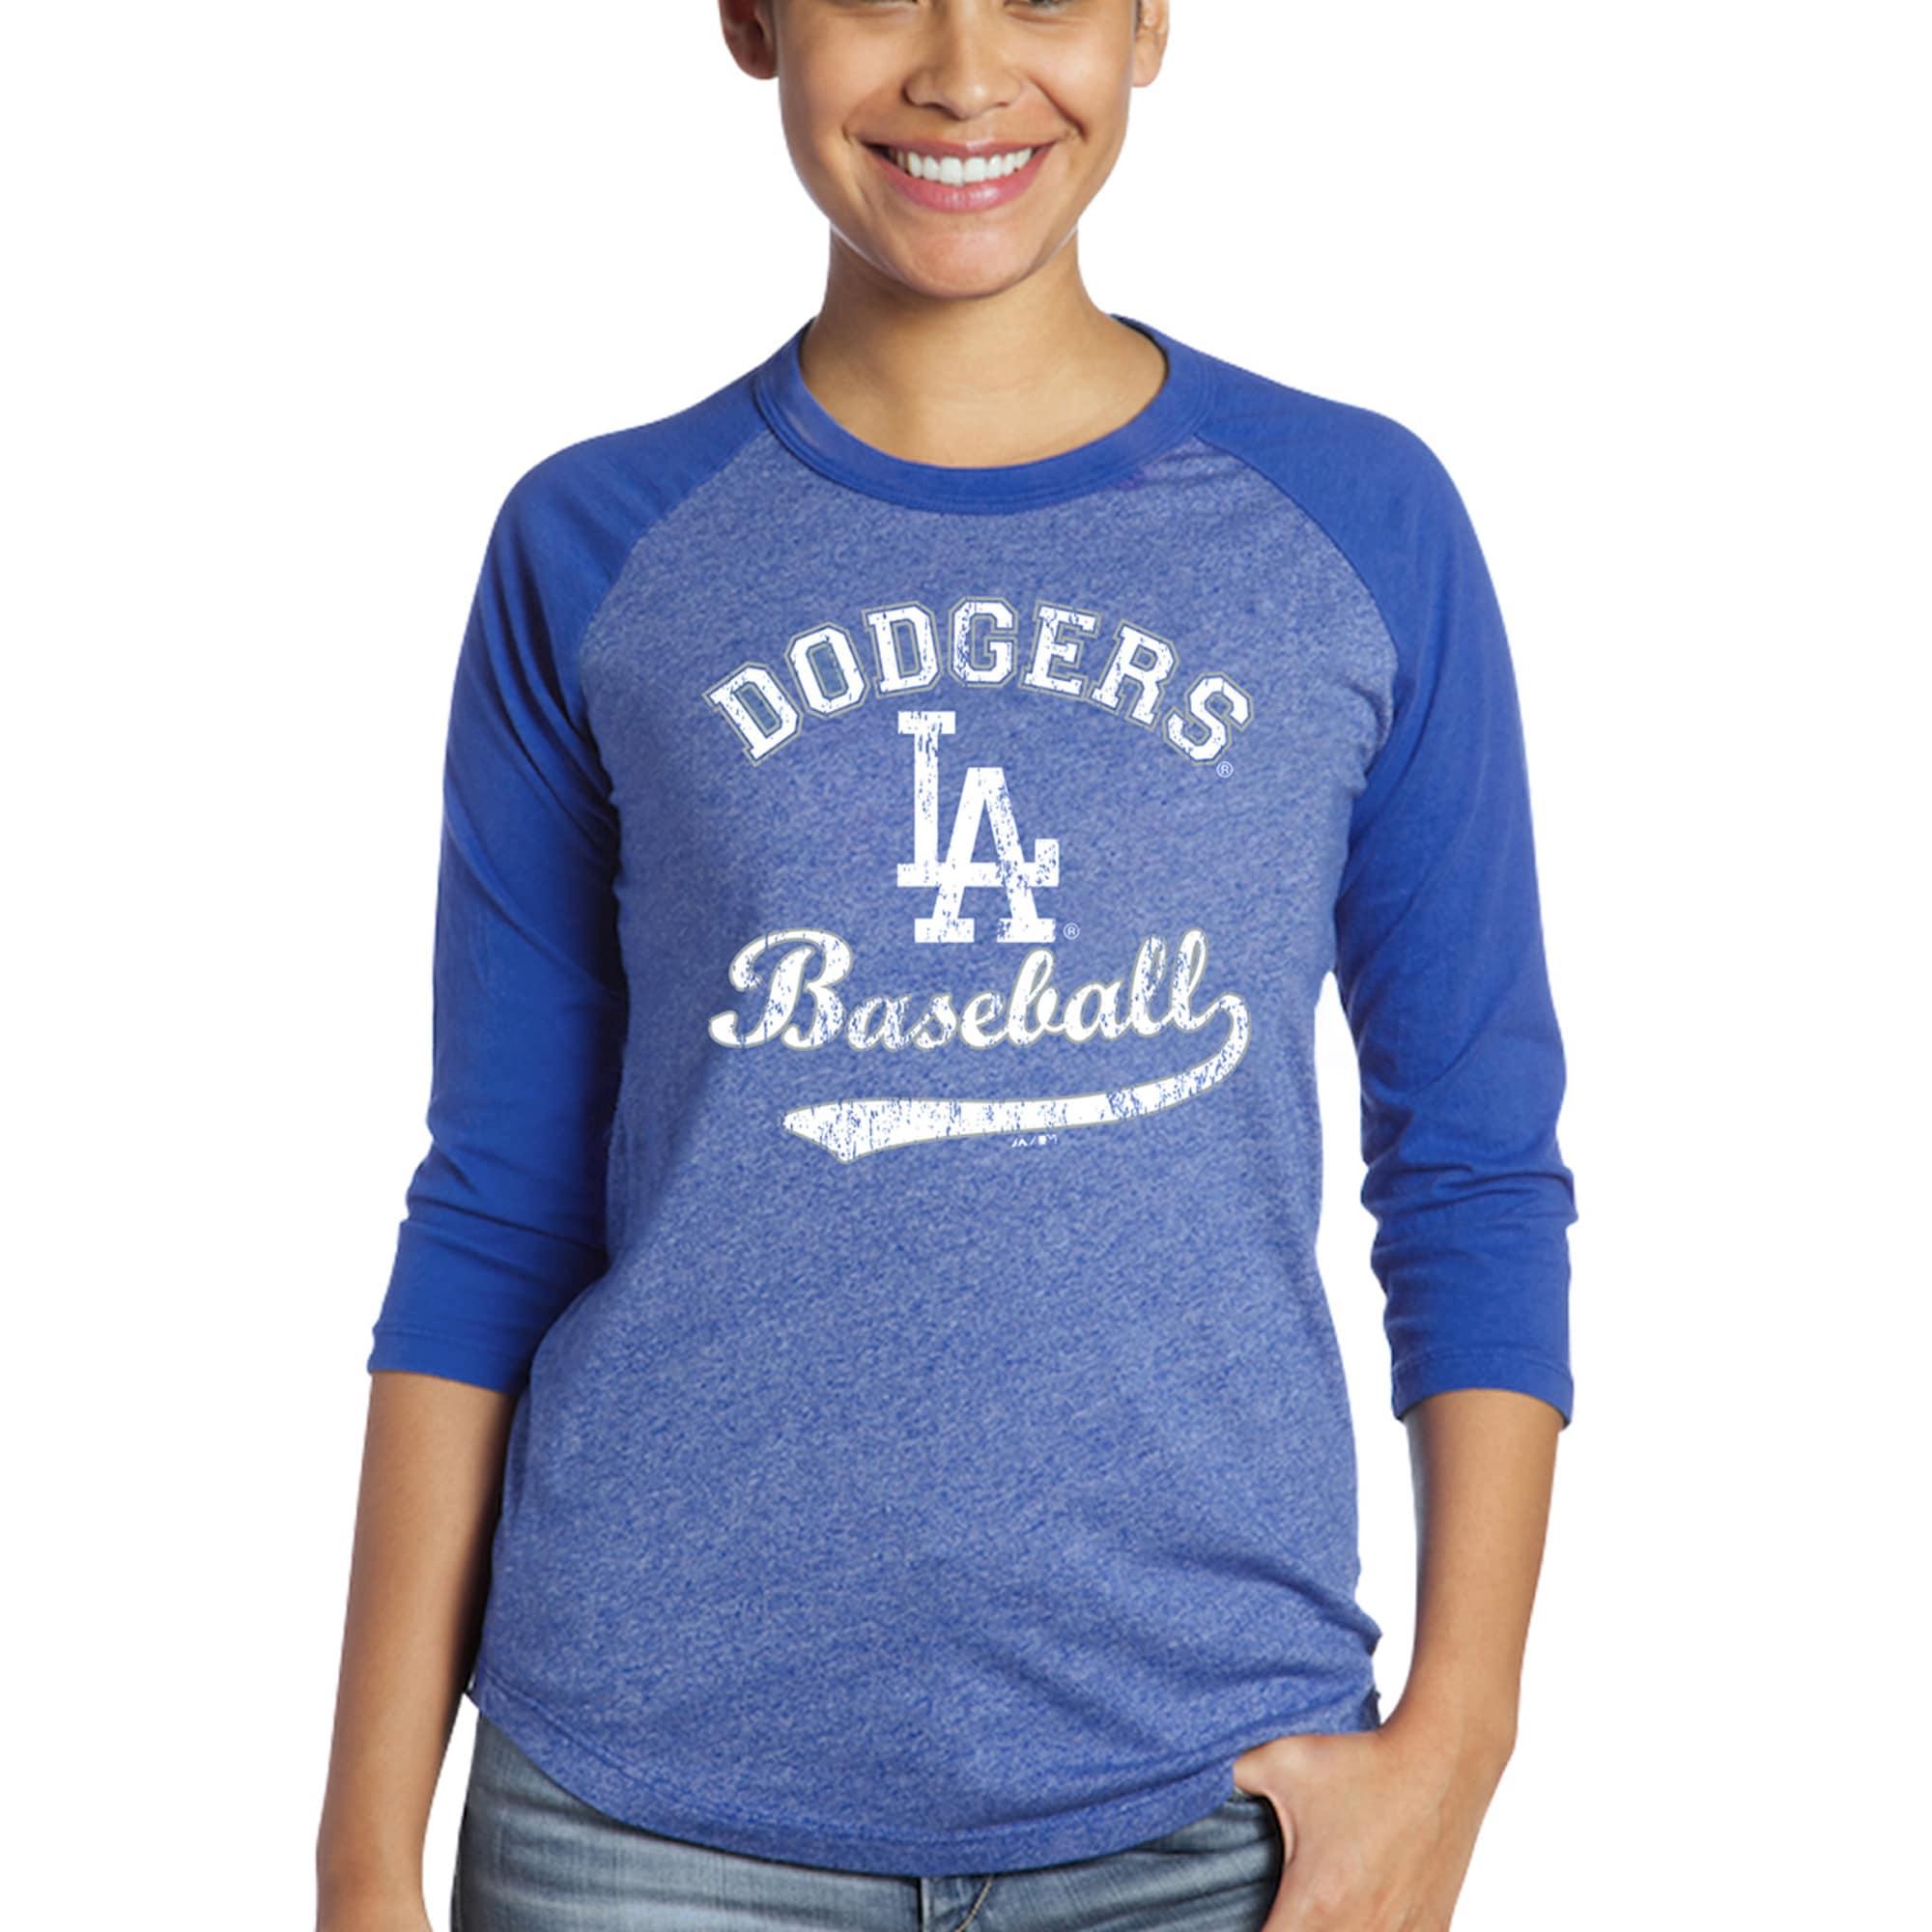 Los Angeles Dodgers Majestic Threads Women's Team Baseball Three-Quarter Raglan Sleeve Tri-Blend T-Shirt - Royal